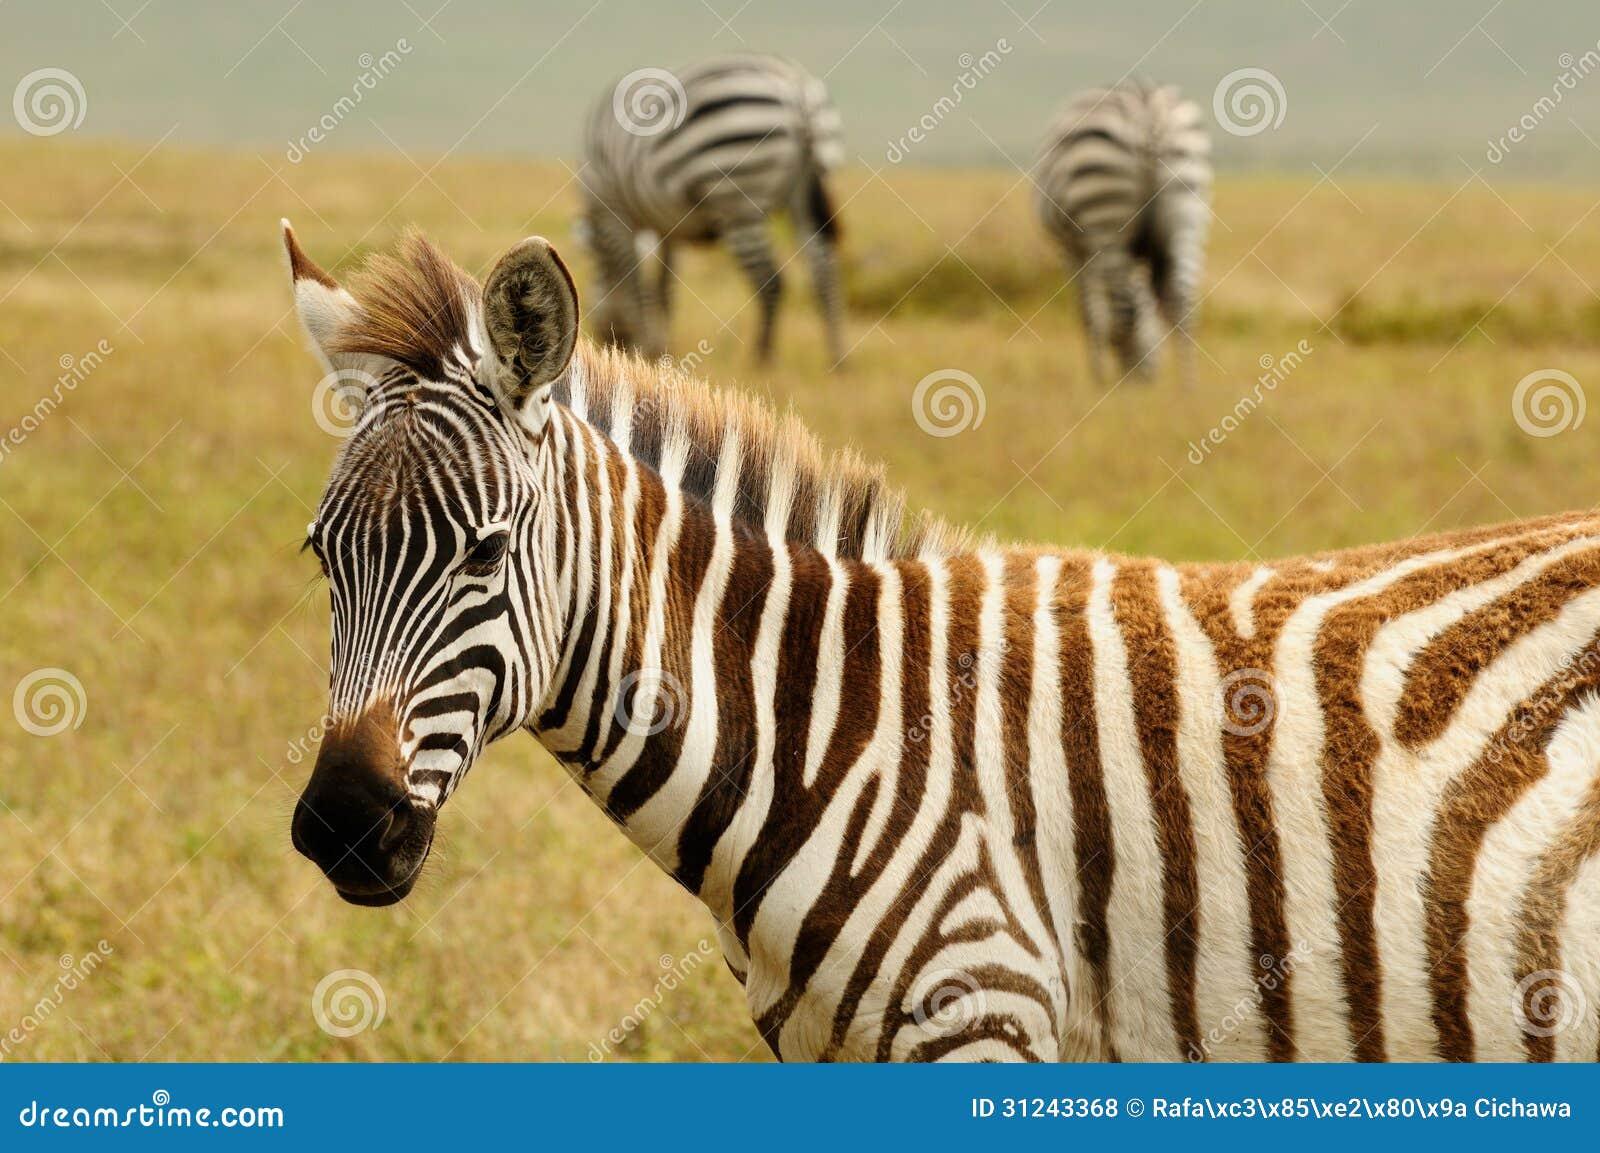 wild lebende tiere in afrika stockfoto bild 31243368. Black Bedroom Furniture Sets. Home Design Ideas